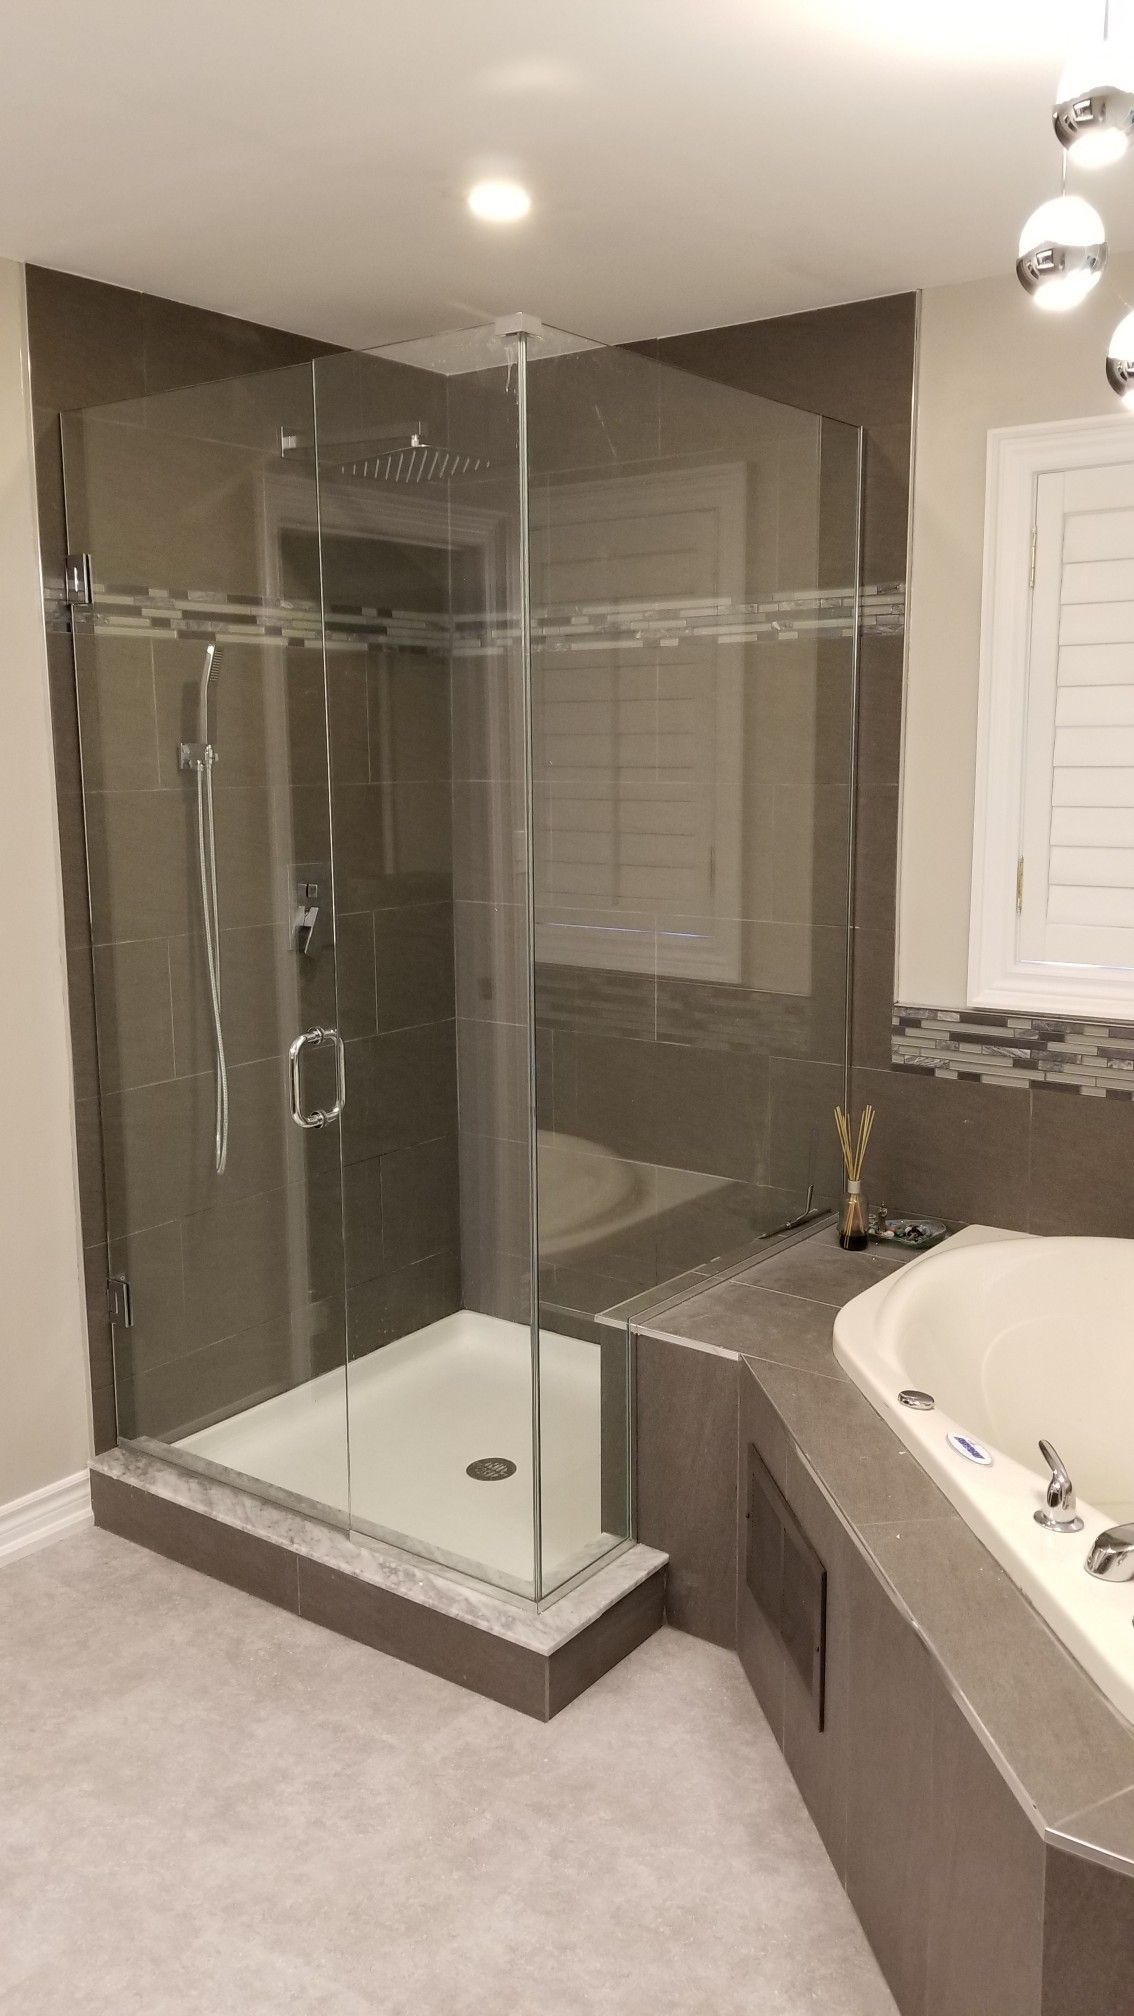 Glass Shower Enclosure With Rain Head Accent Tiles Jacuzzi Tub